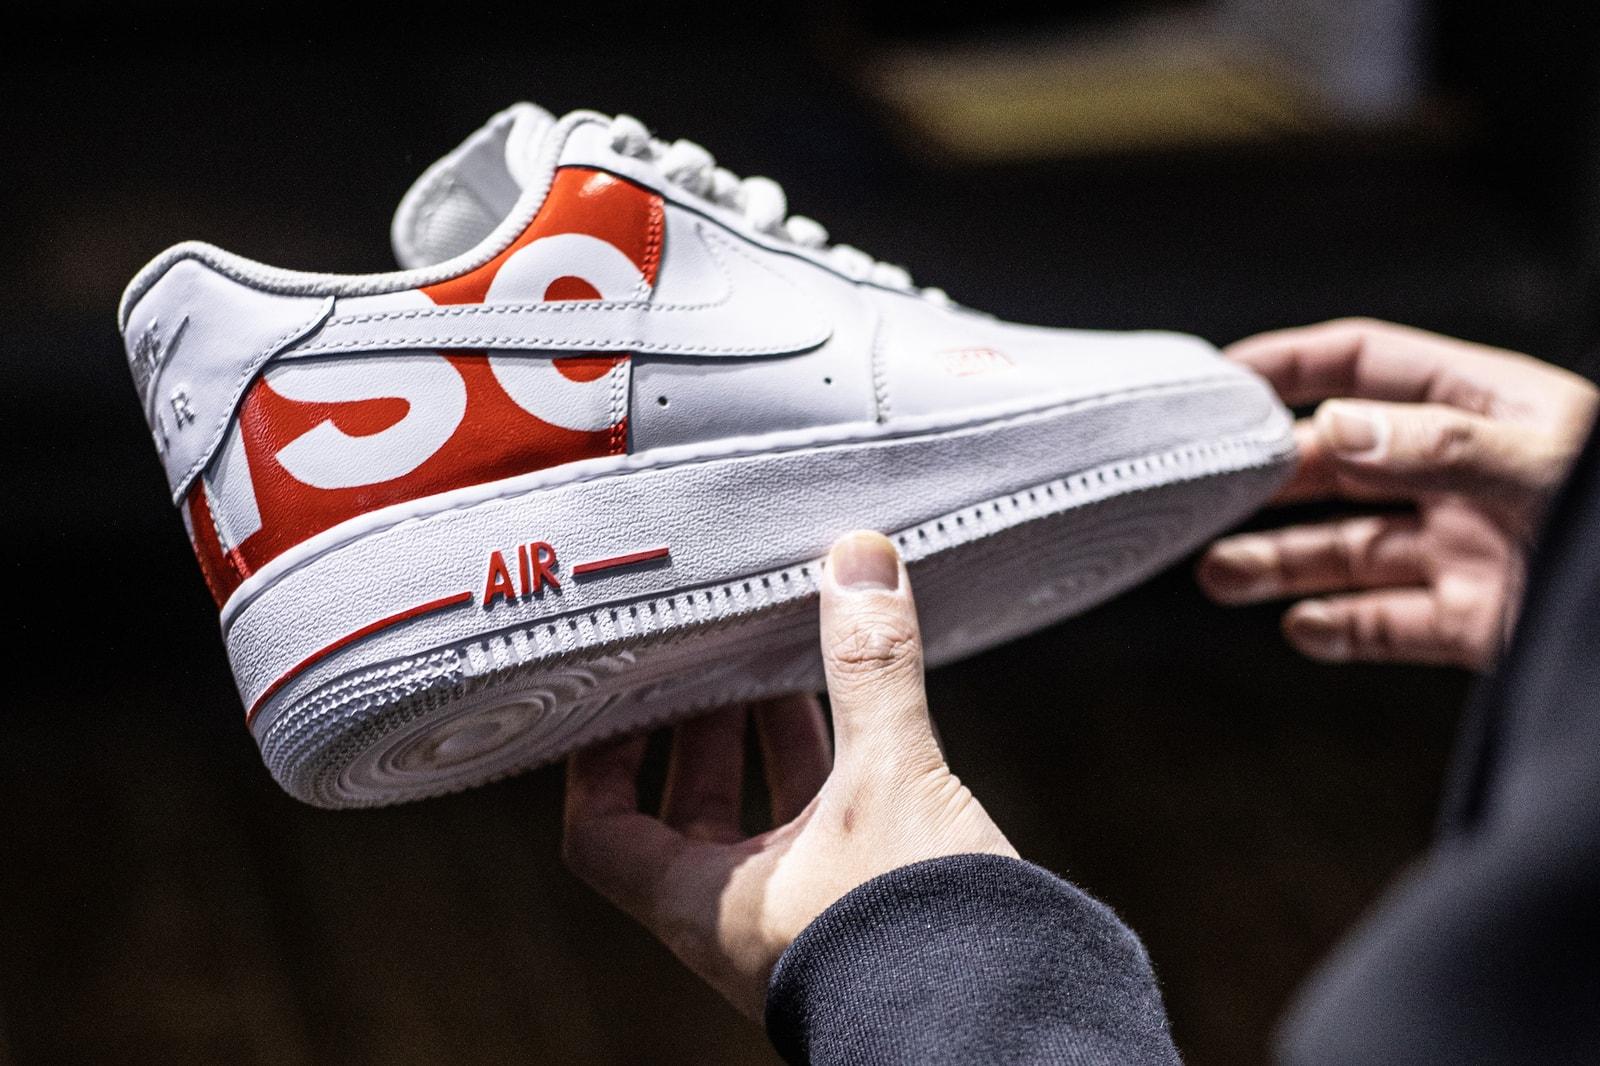 Nike Air Force 1 如何打开涂鸦艺术家 ABS-NOISE 的「球鞋之门」| Sole Mates